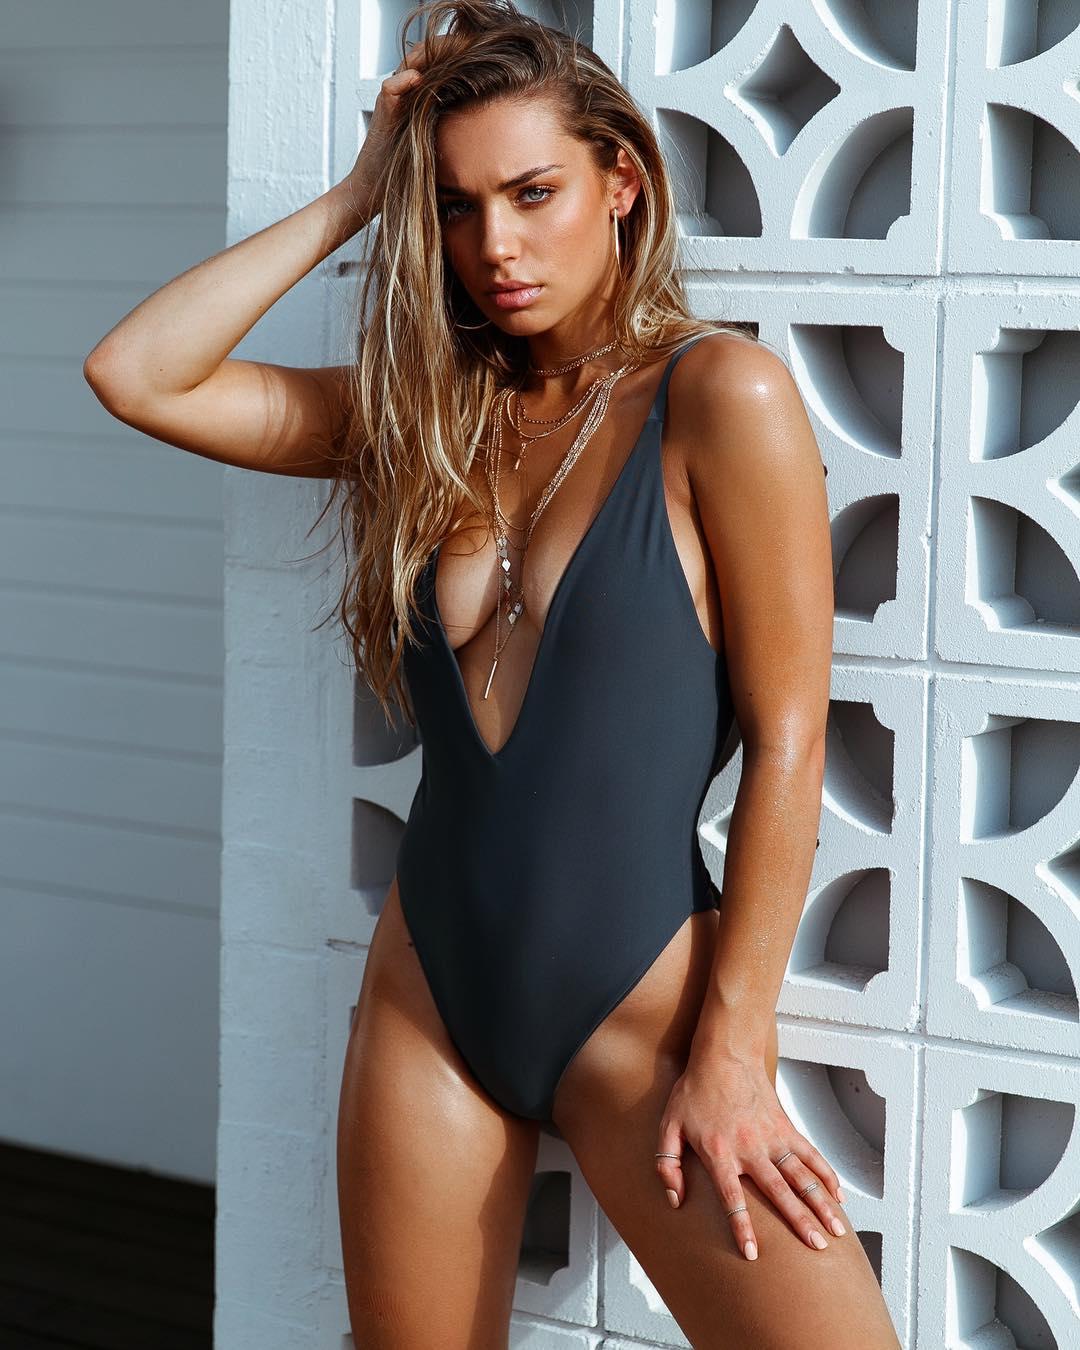 Olivia Pollock